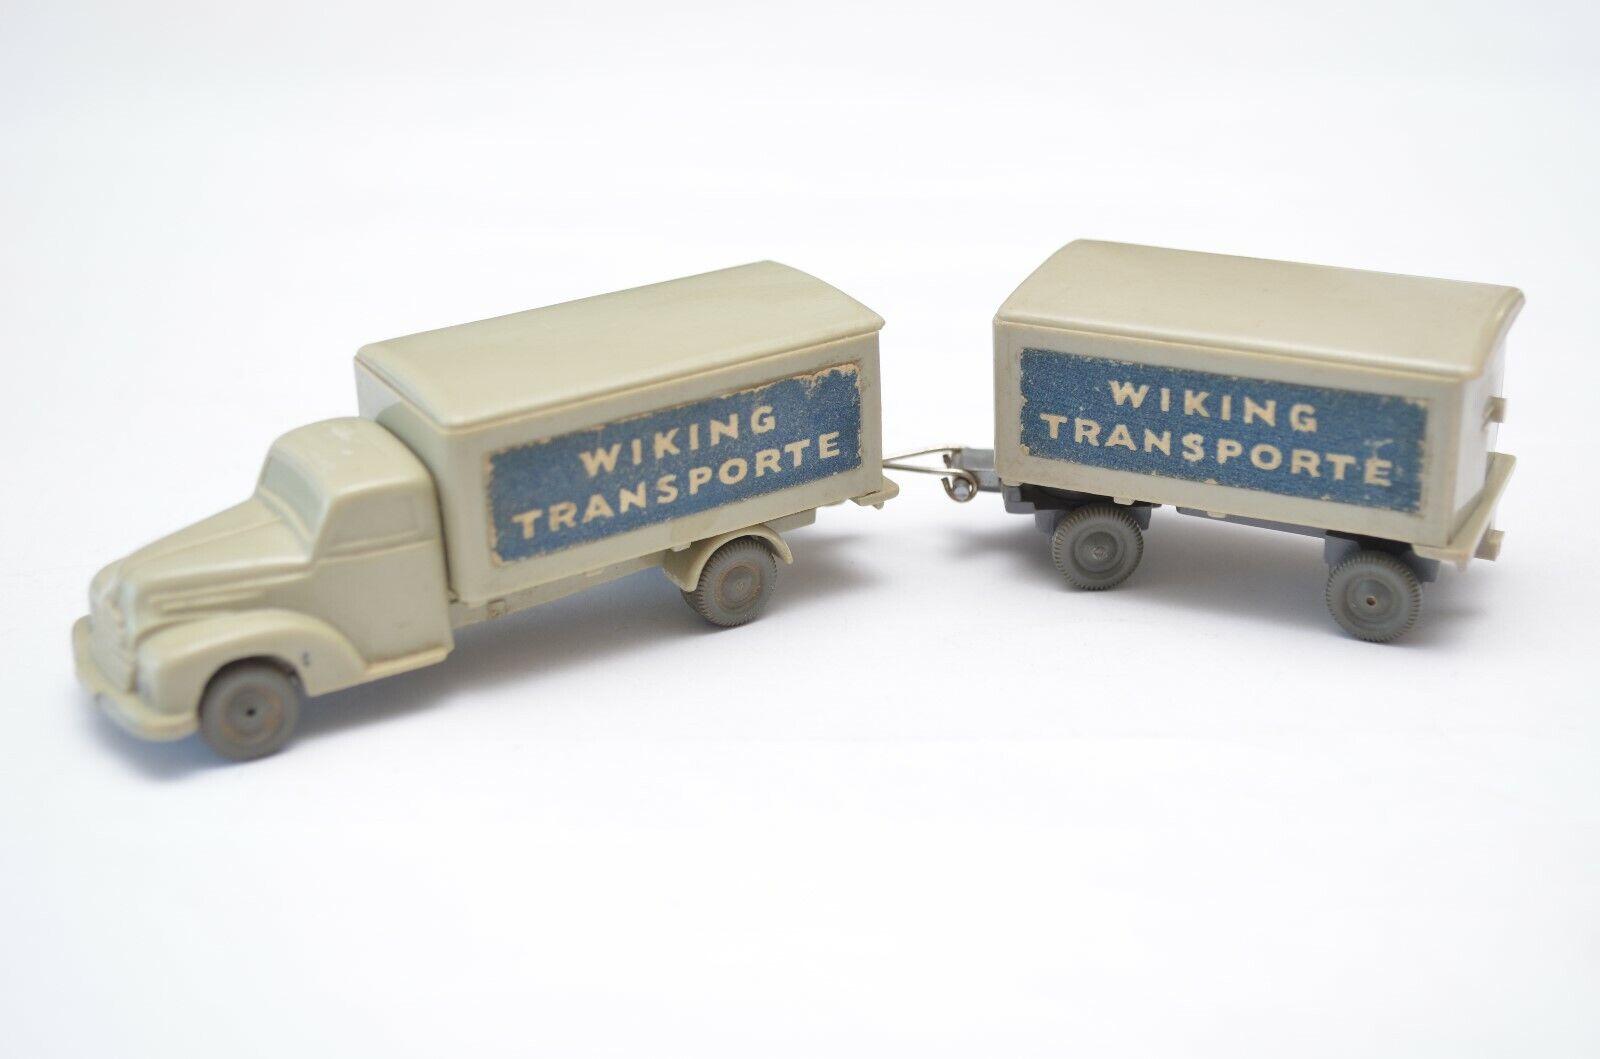 Wiking Transporte 176 2E unverglast Ford 3500 Gliederzug Modell HO 1 87